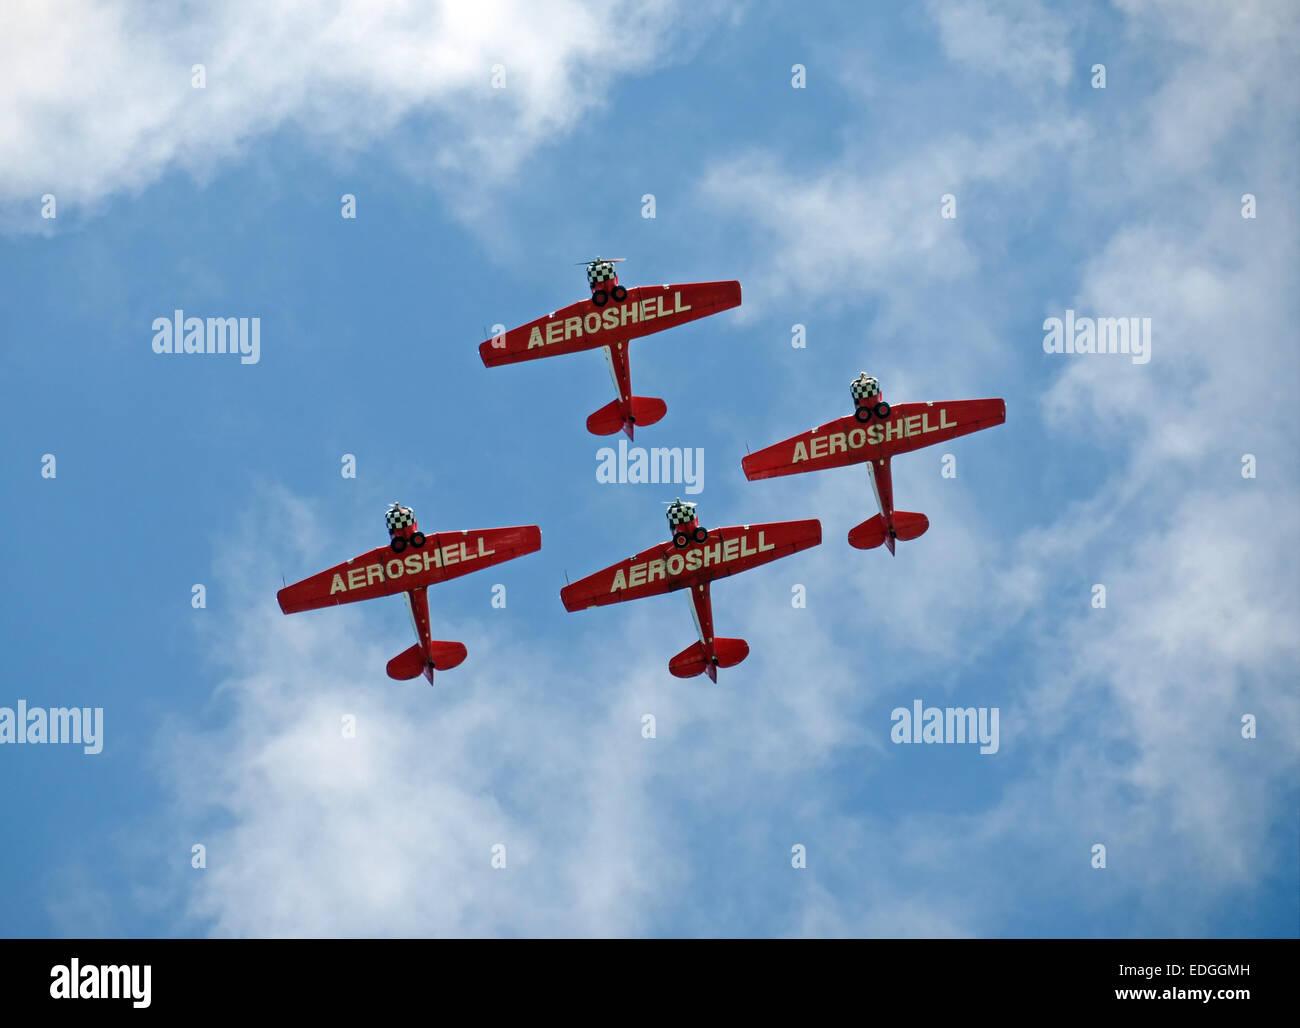 Stuart, USA - November 1, 2013: Members of the Aeroshell Aerobatic Team pass over Stuart, Florida on the way to - Stock Image